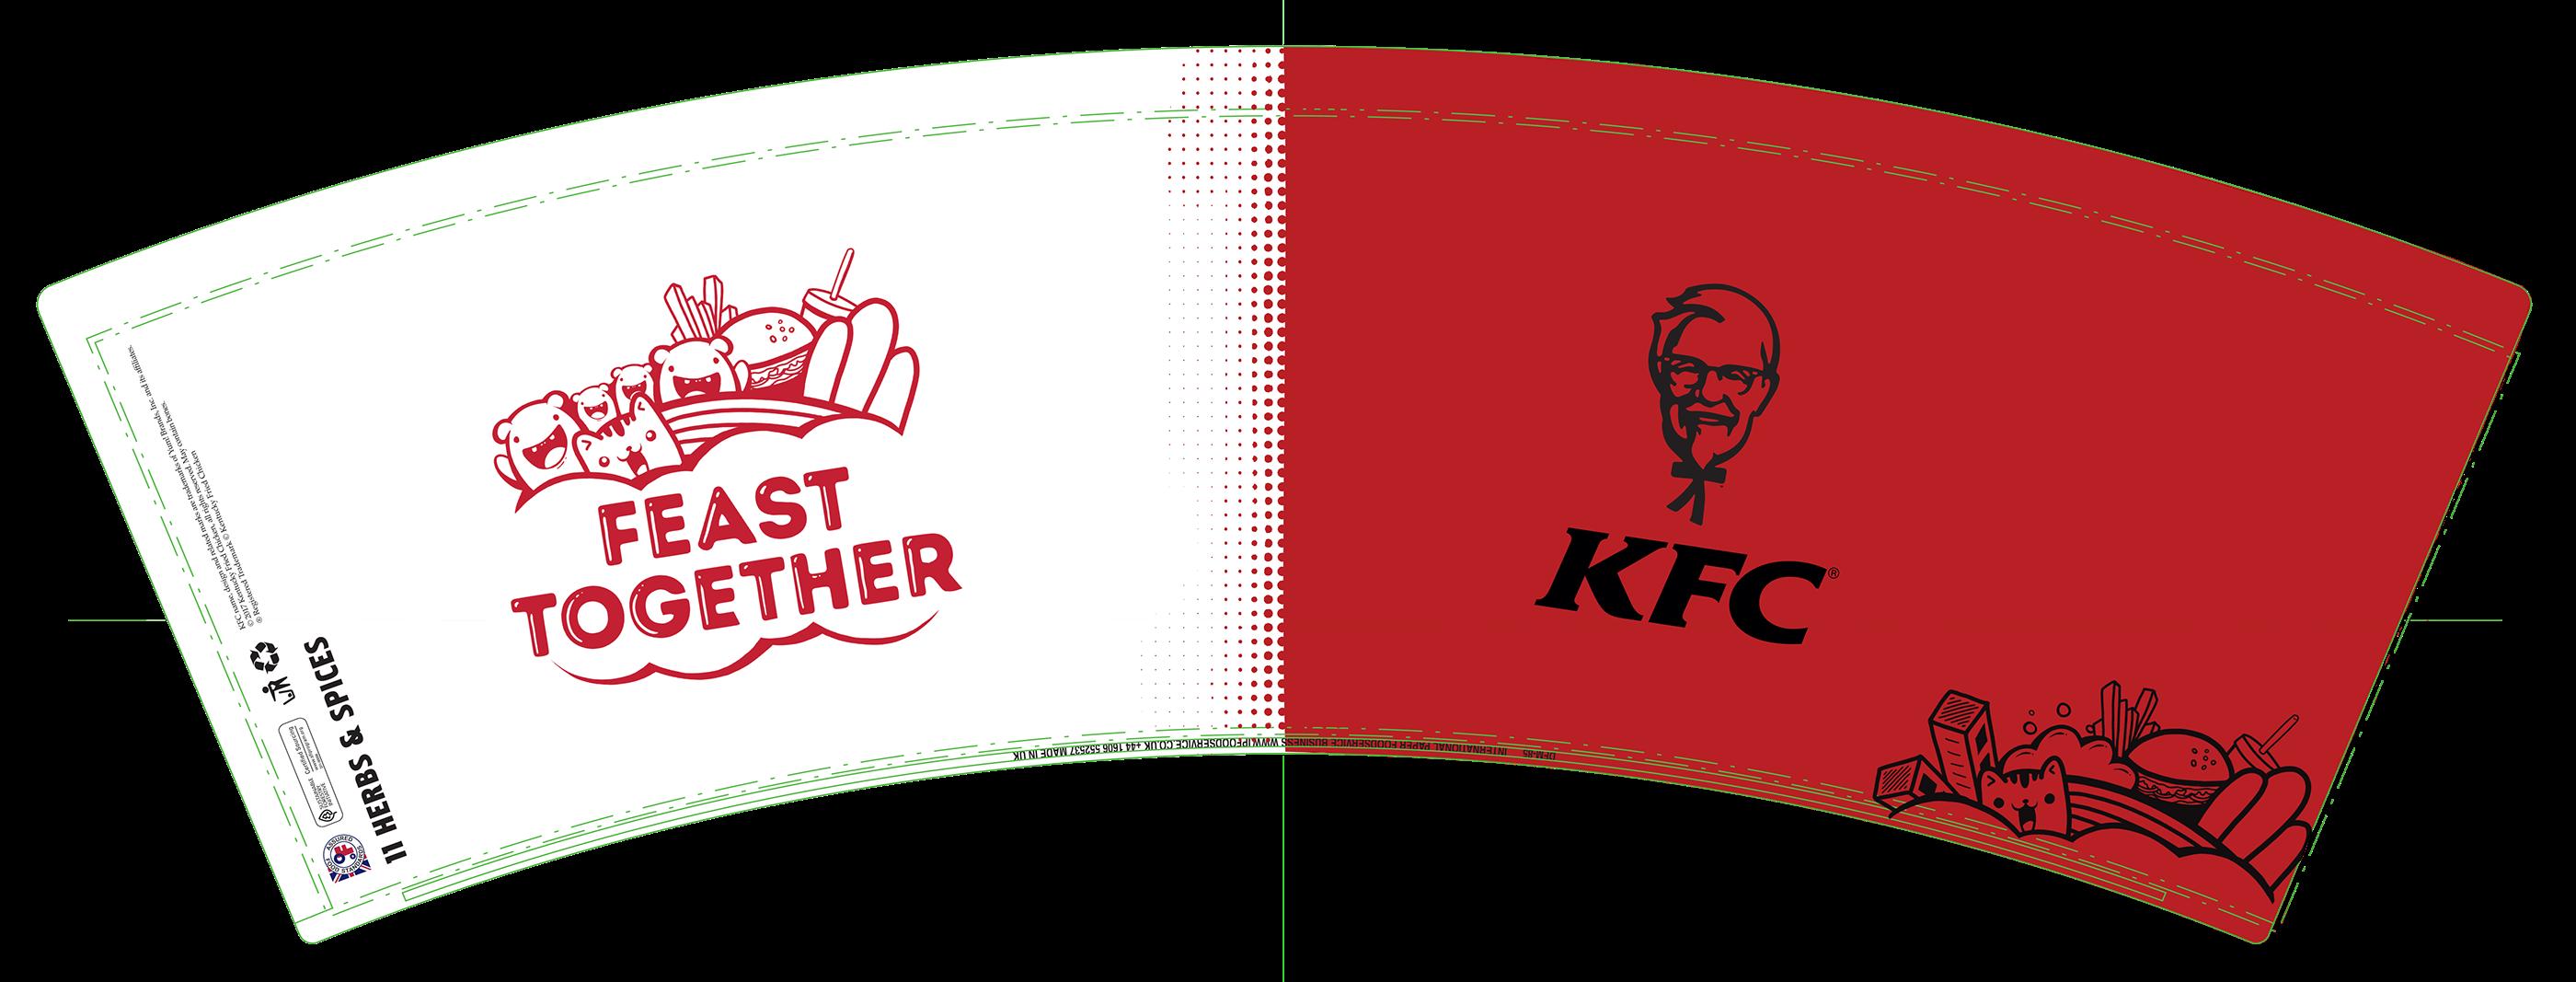 YCN KFC - LIVE BRIEF on Behance